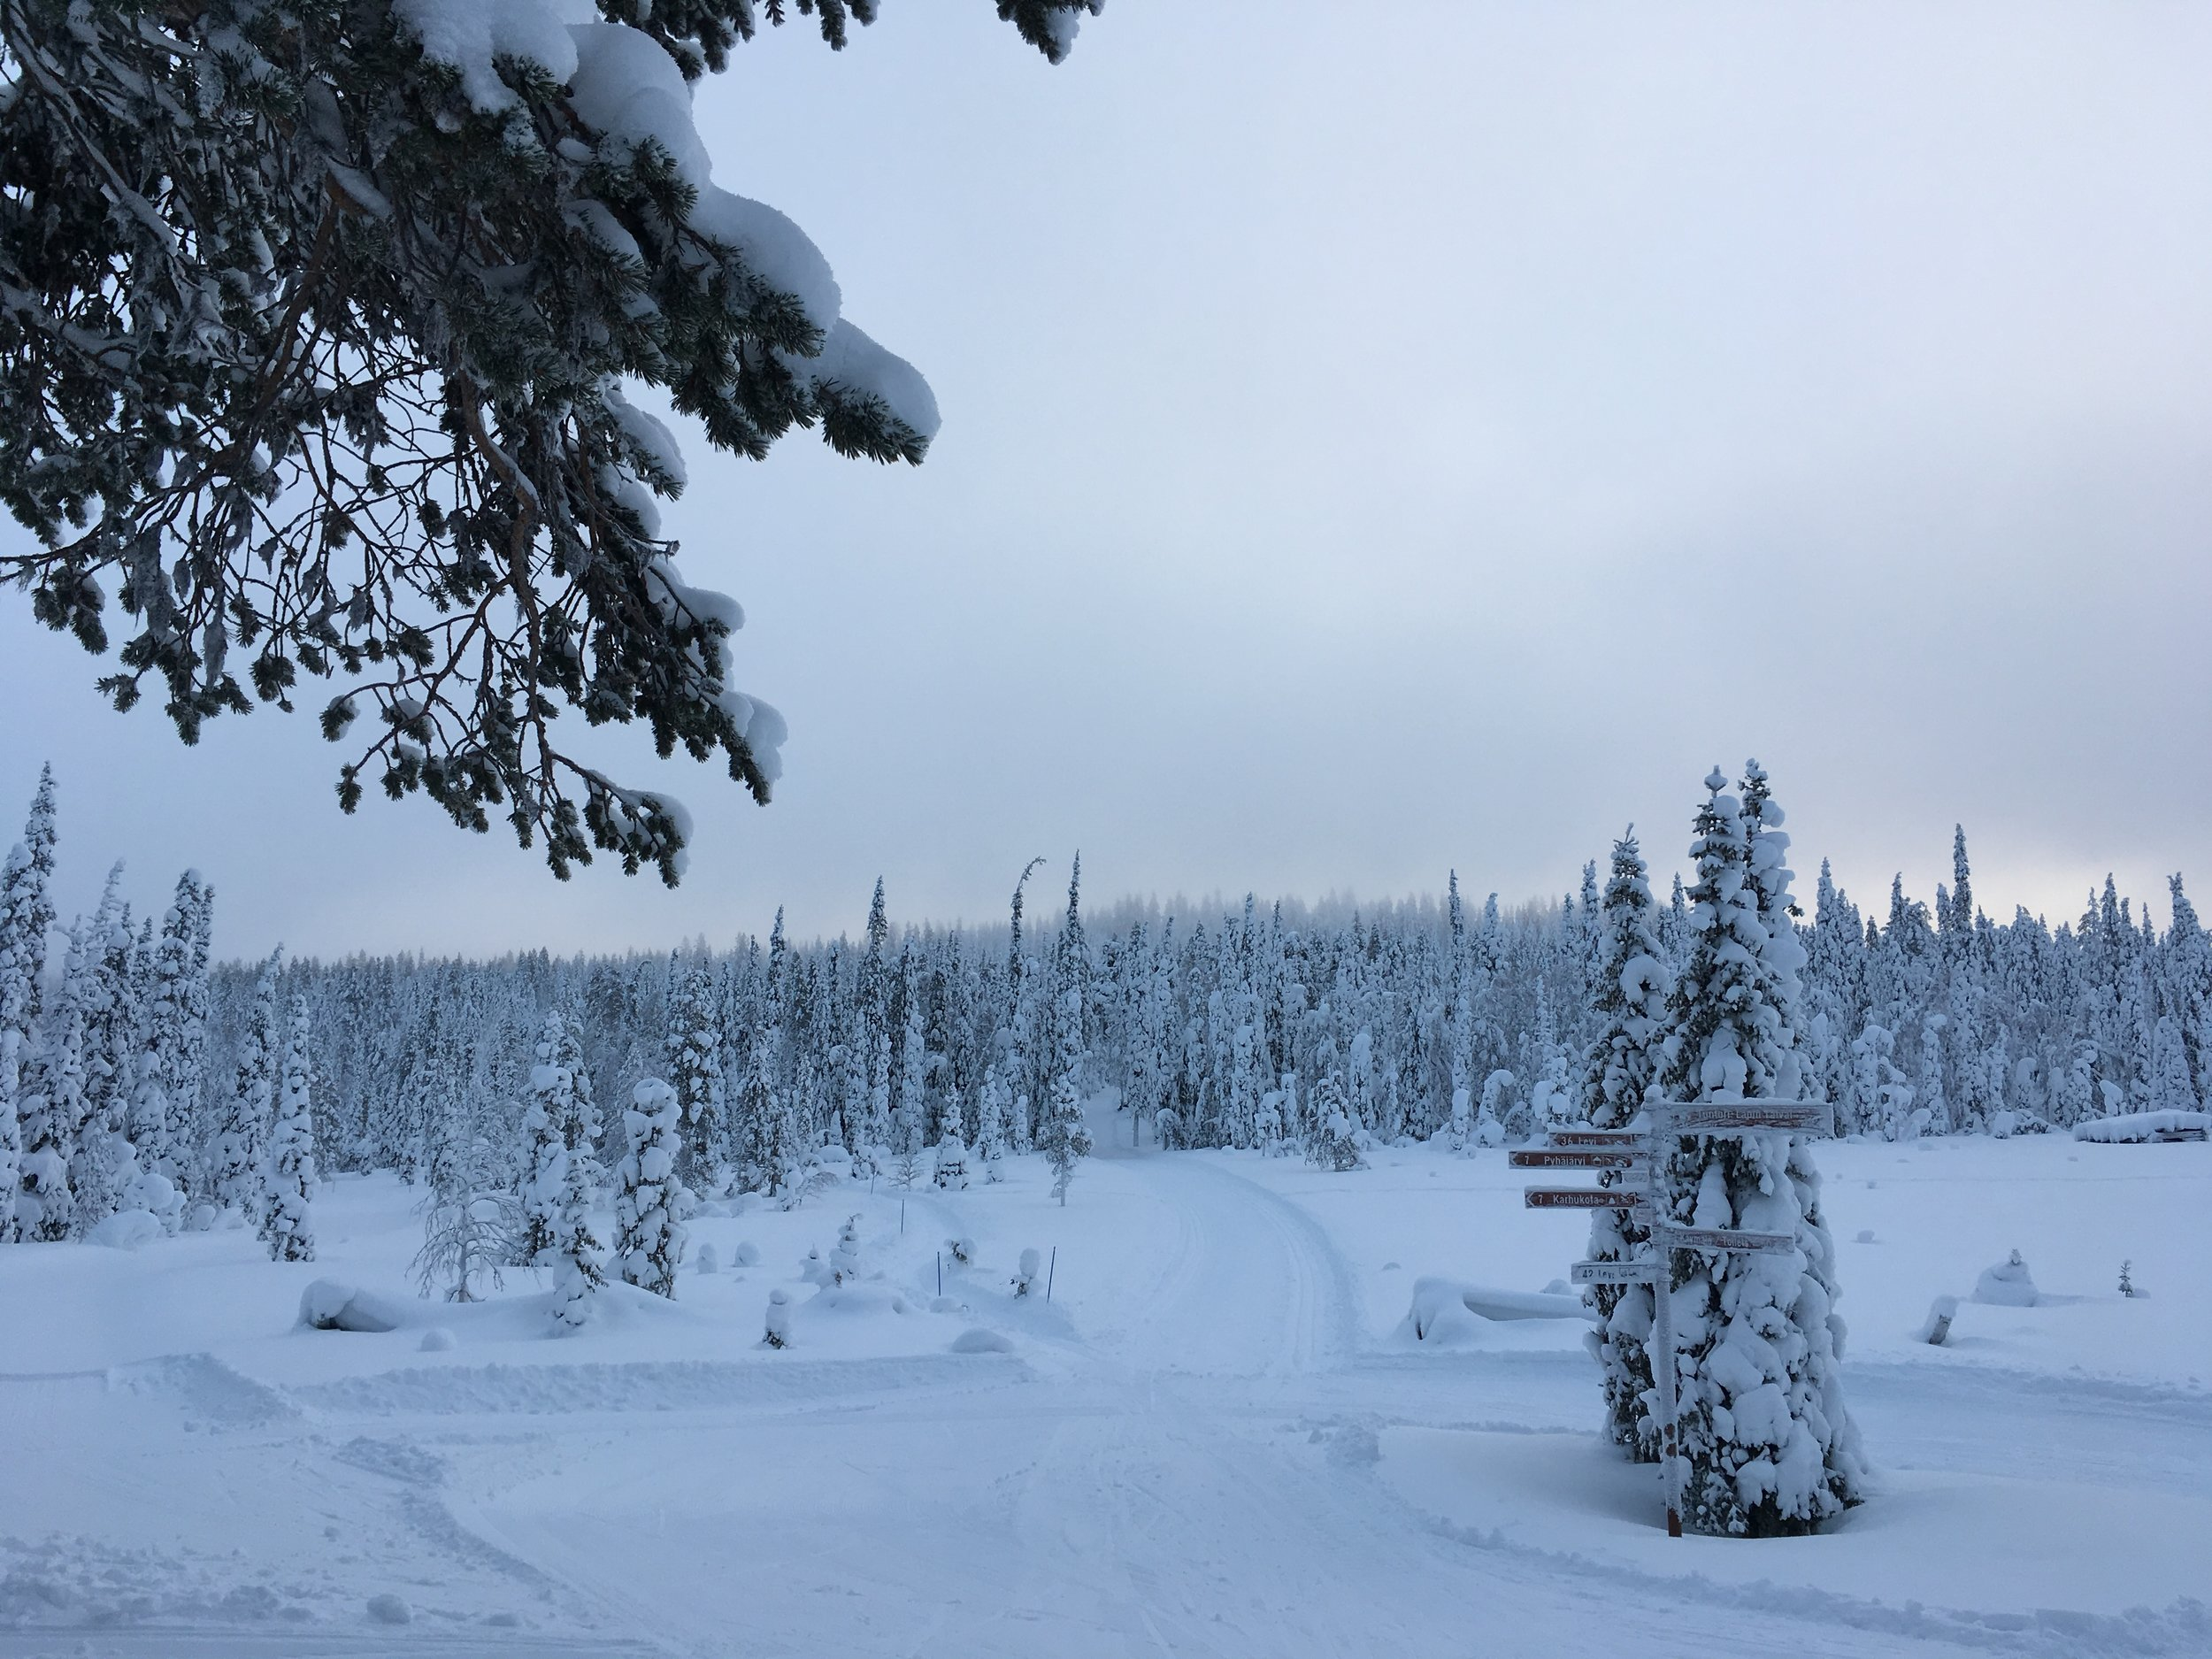 Where I would most like to find myself: Äkäslompolo, Finland